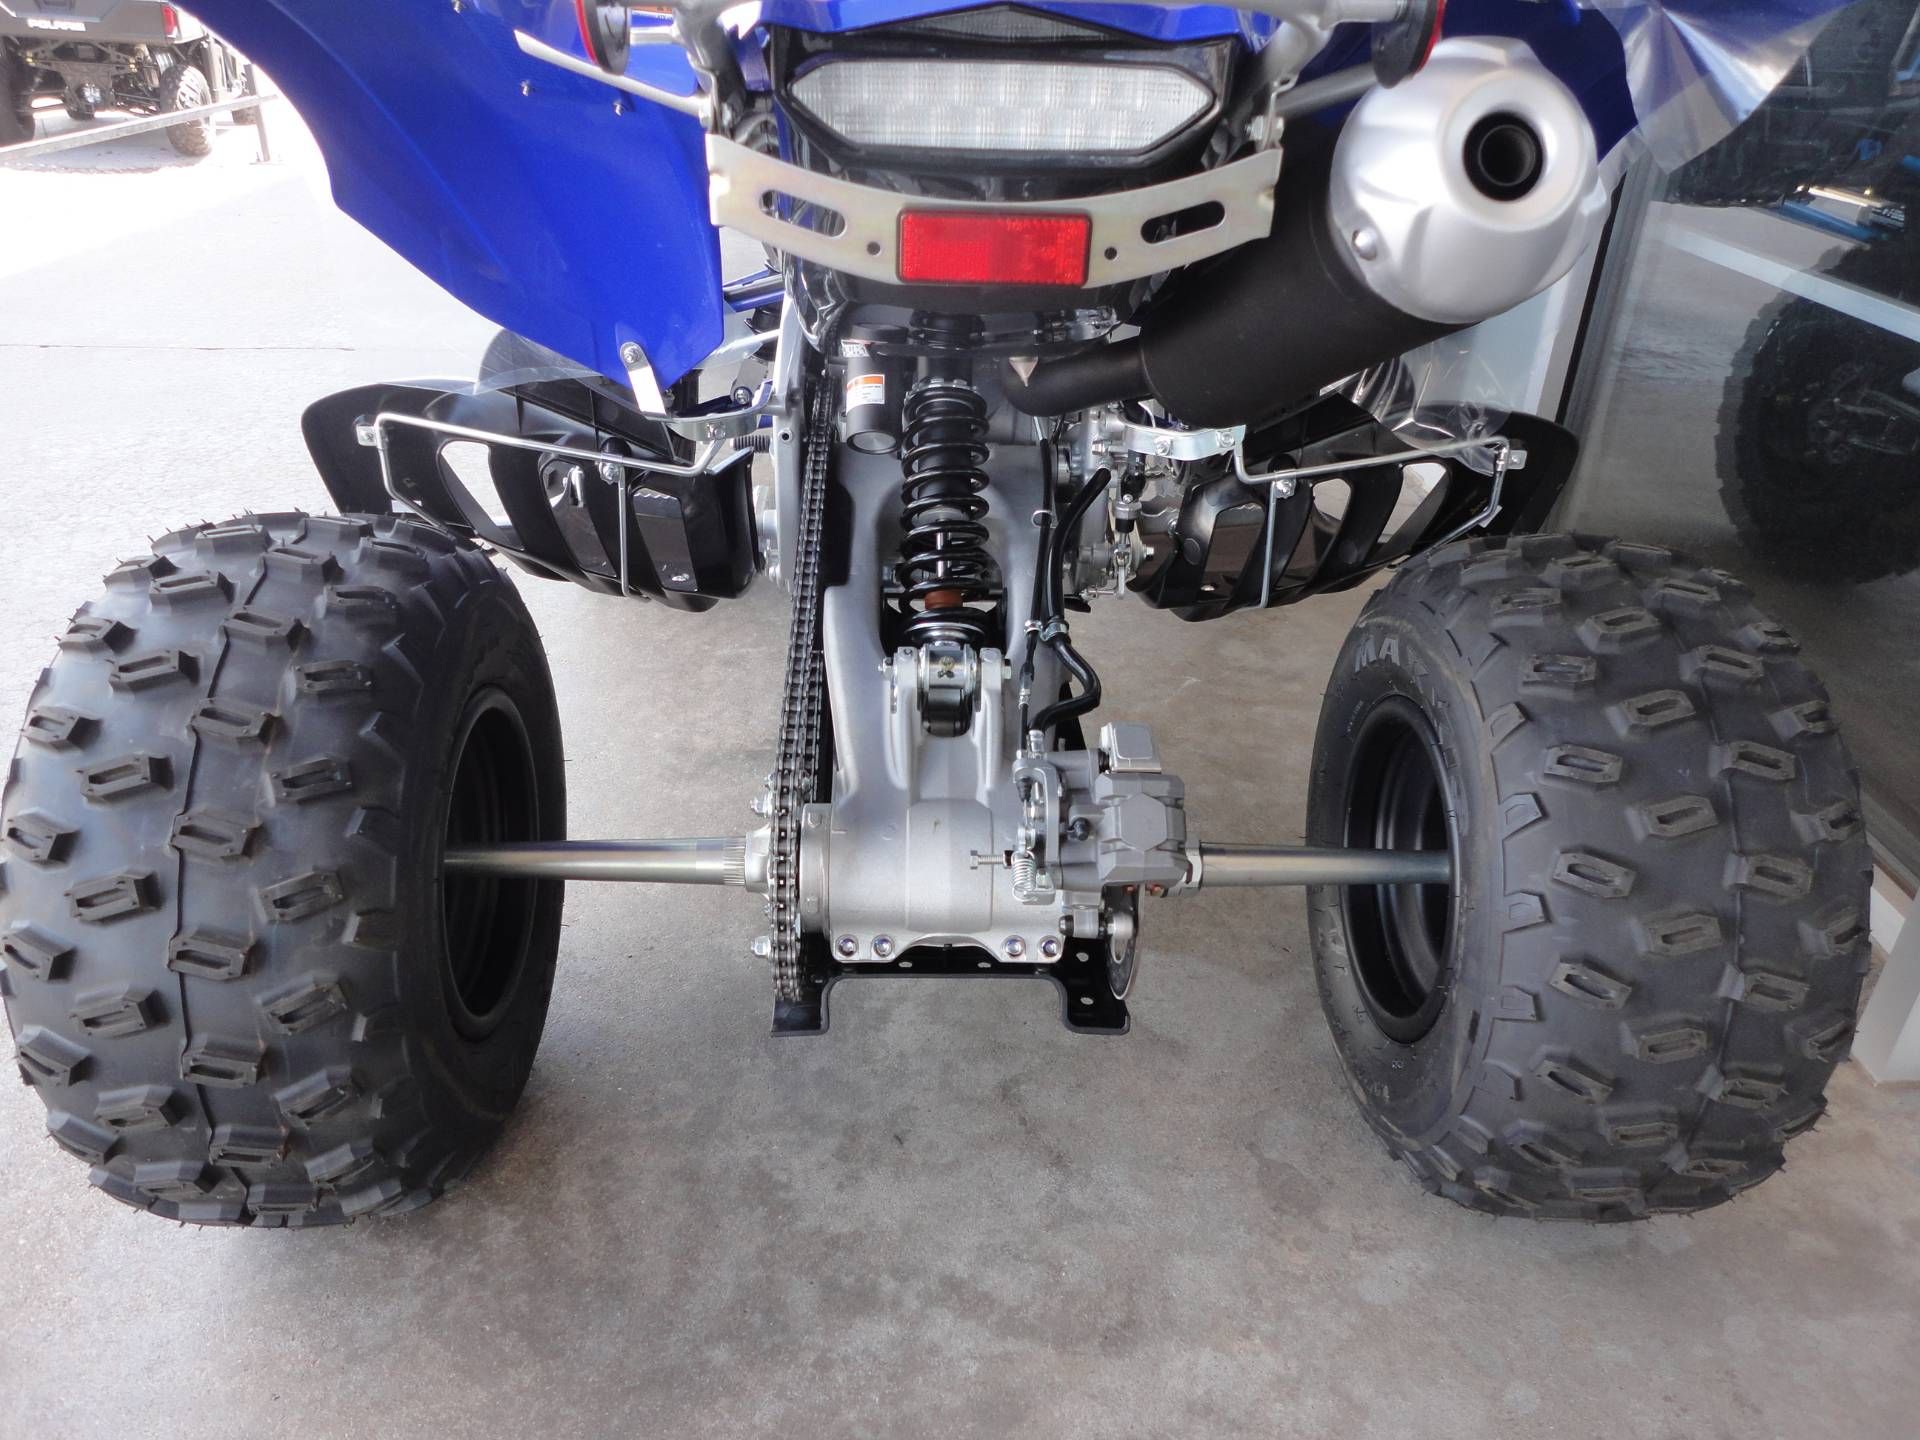 2020 Yamaha Raptor 700R 12